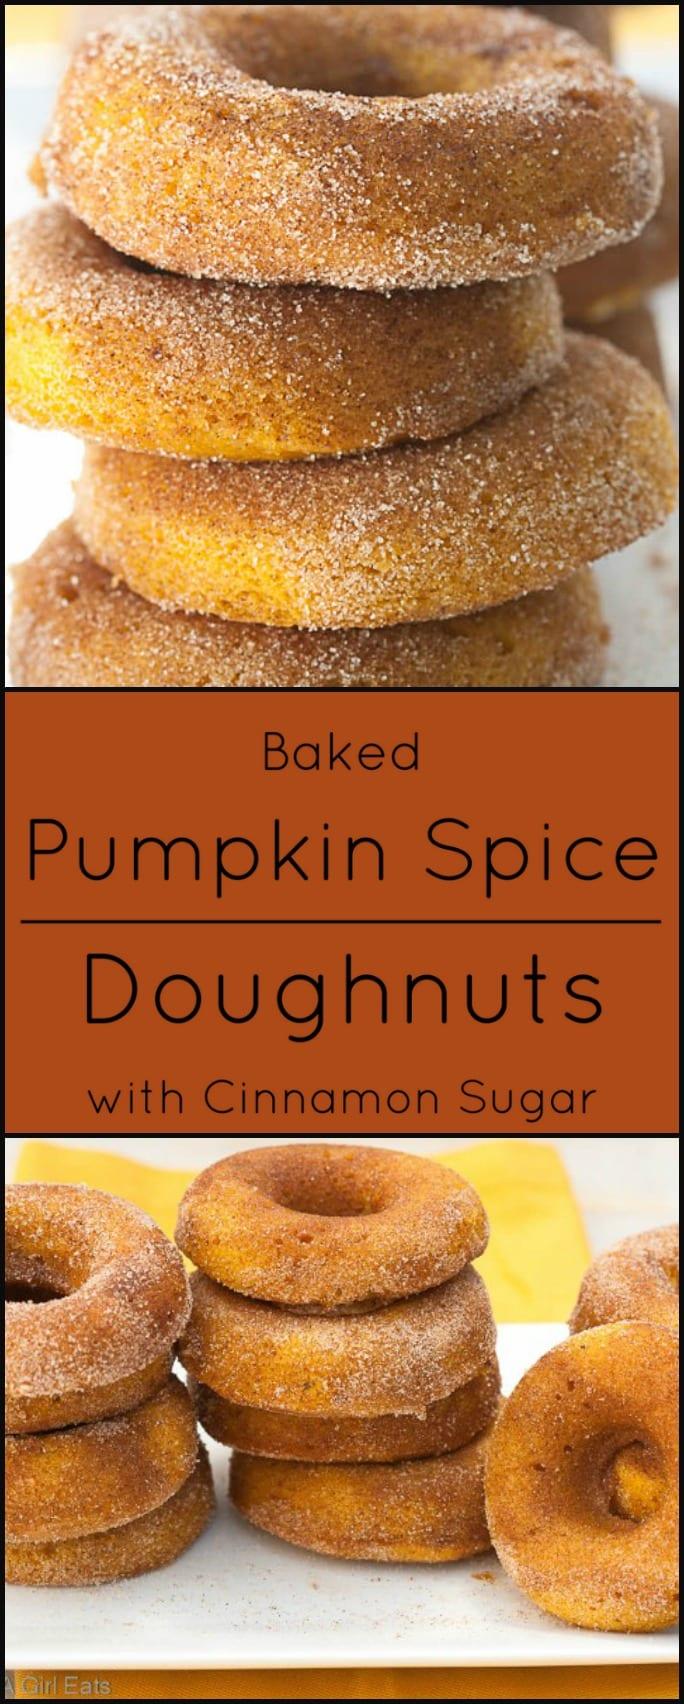 Baked Pumpkin Spice Doughnuts with Cinnamon Sugar. Gluten free option.